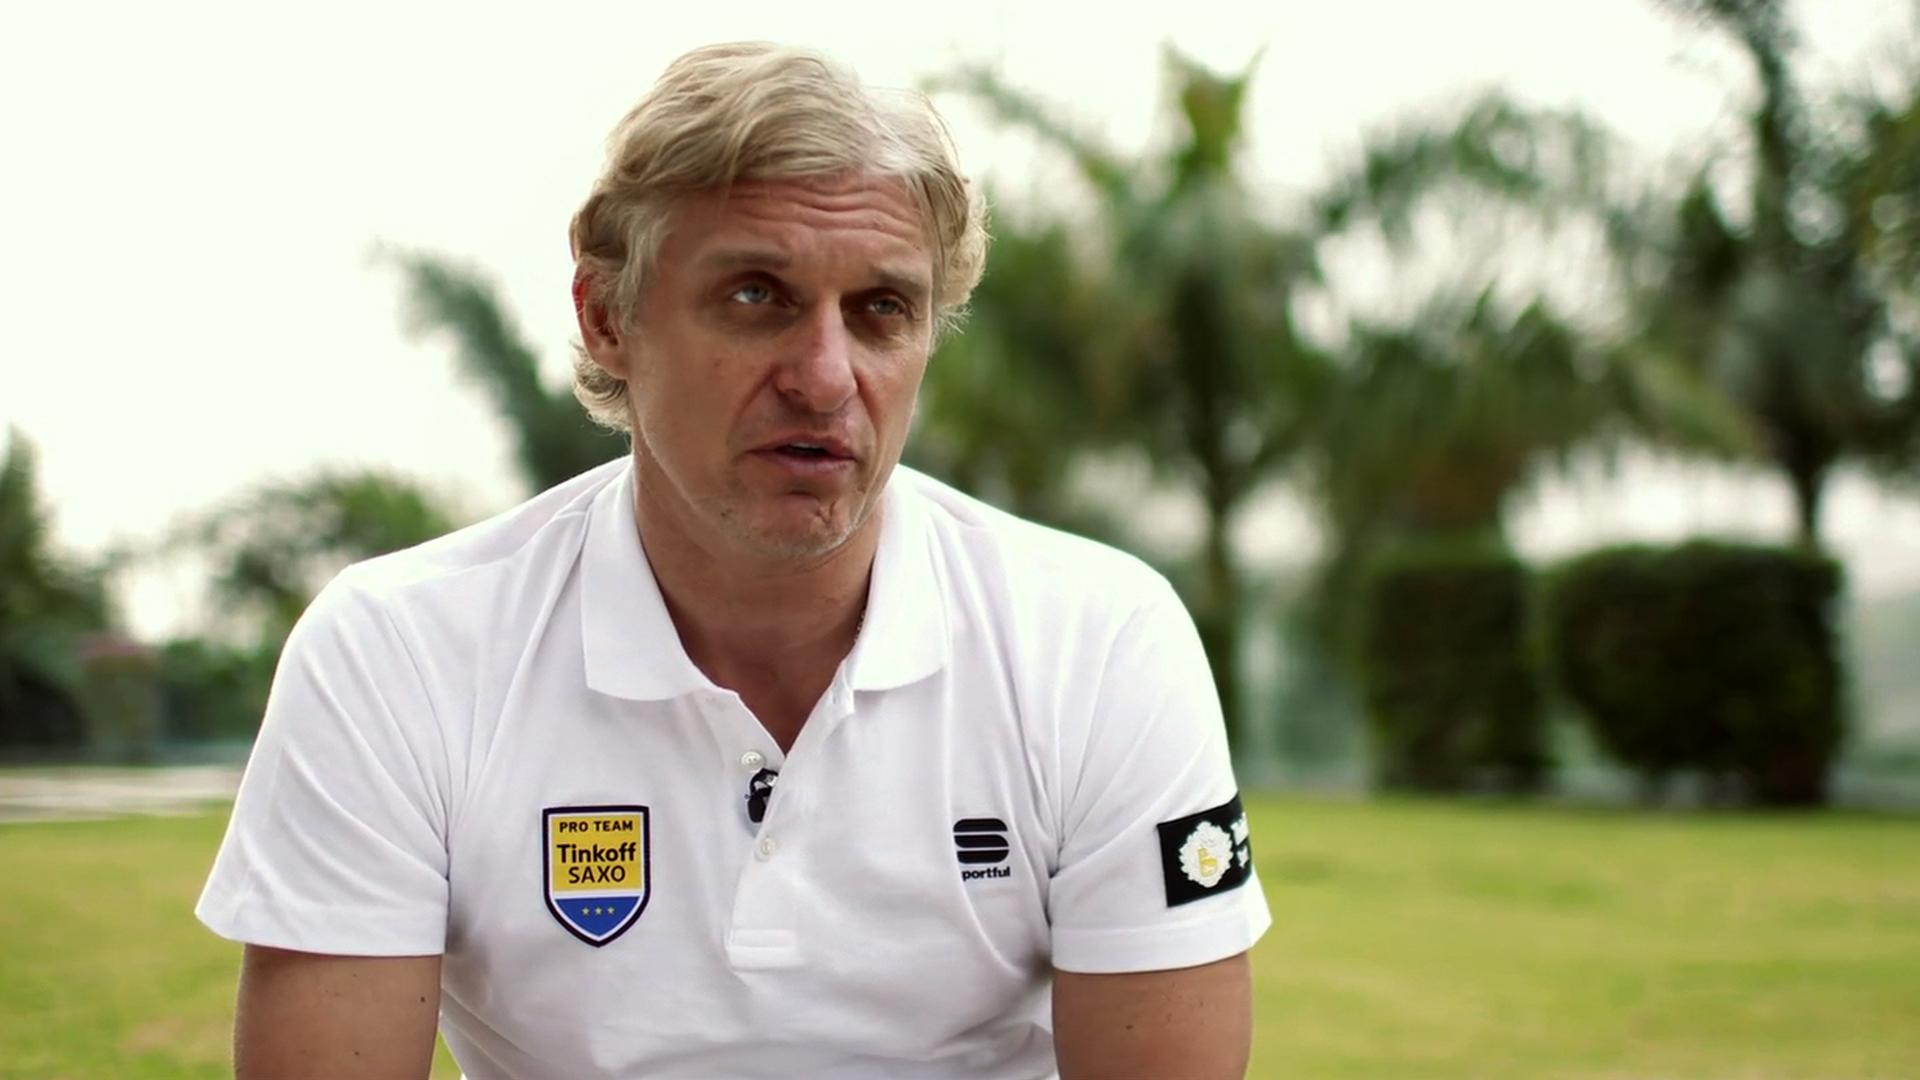 Saxo-Tinkoff team owner Oleg Tinkoff